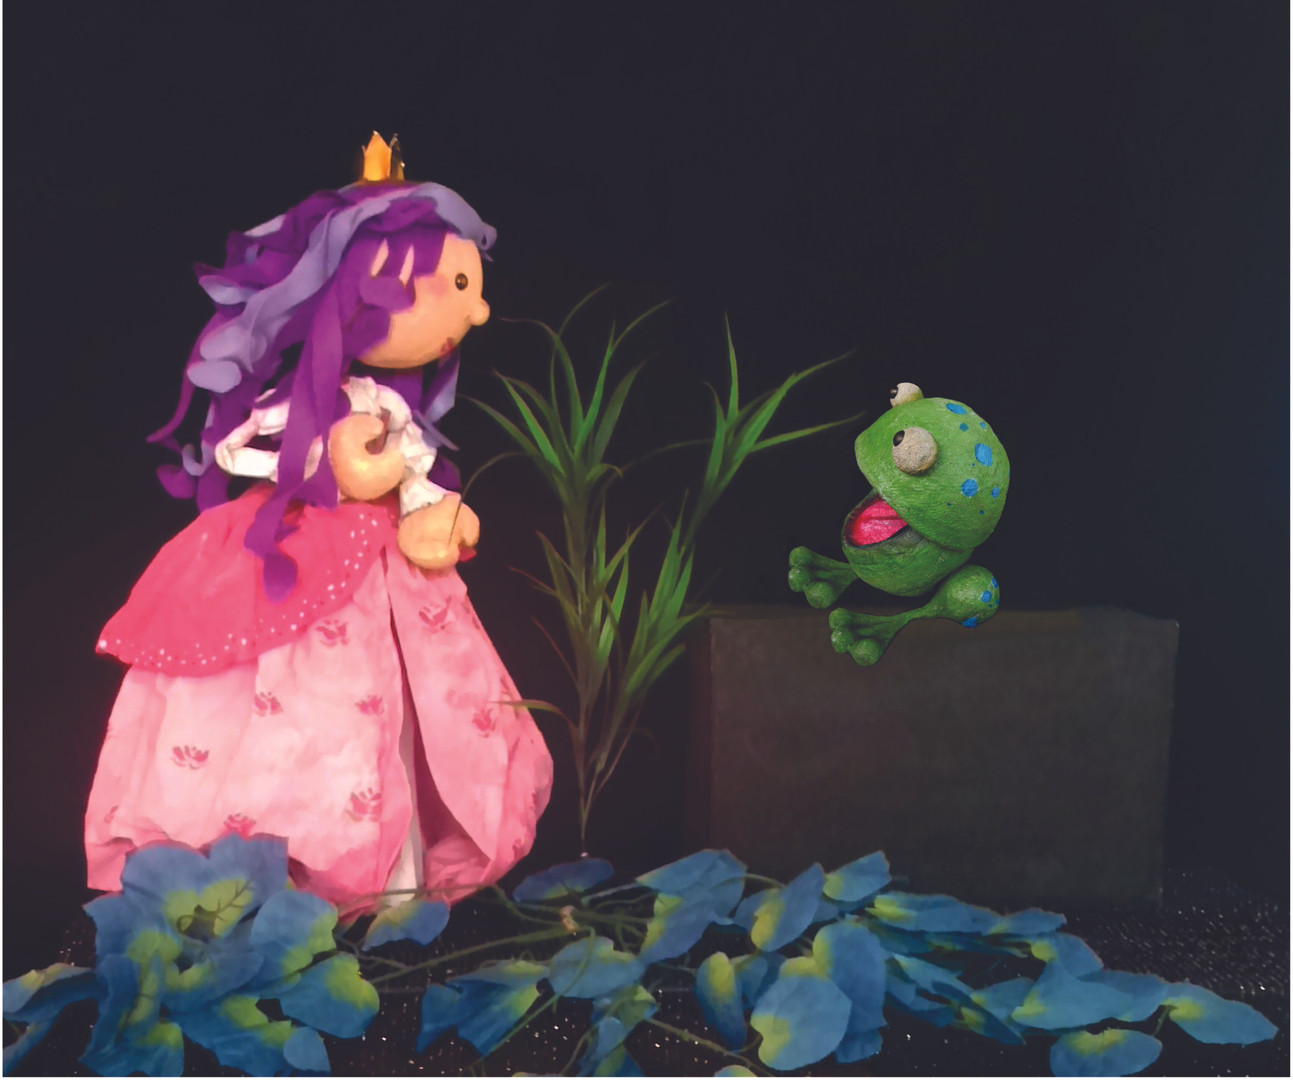 Princesa y sapo 4.jpg